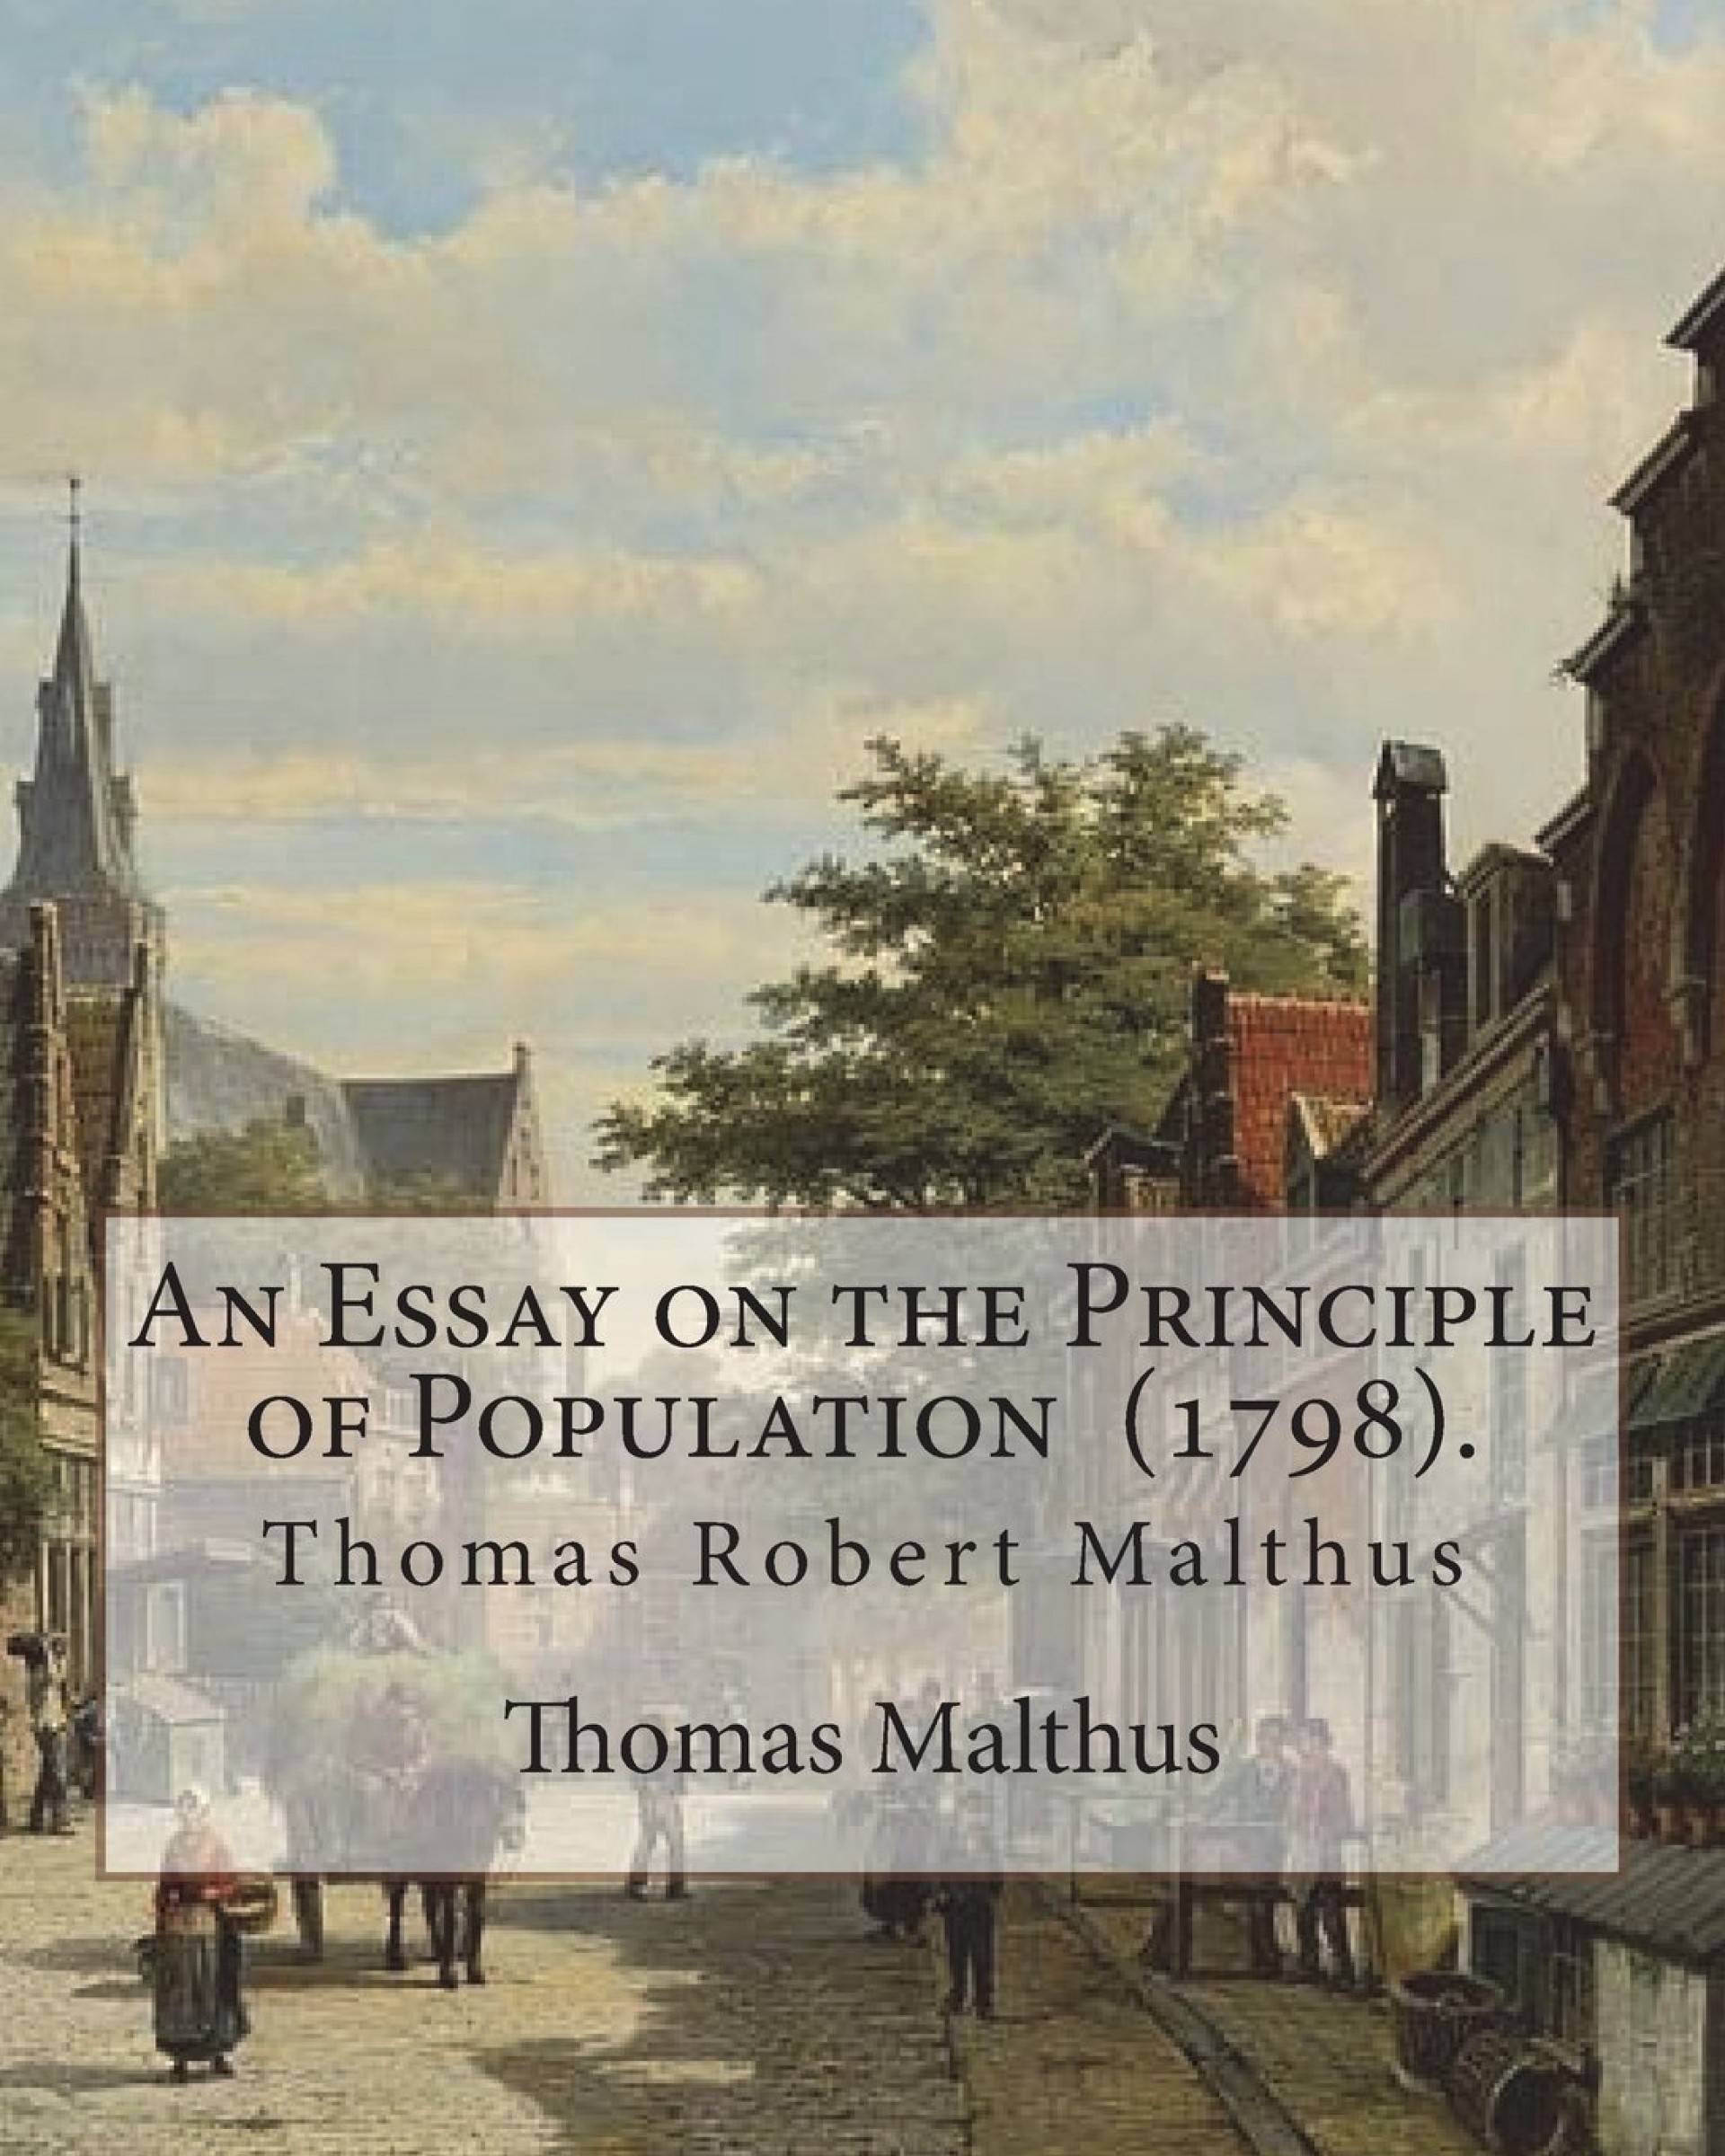 018 Essay On The Principle Of Population 71giypnbhsl Singular Pdf By Thomas Malthus Main Idea 1920